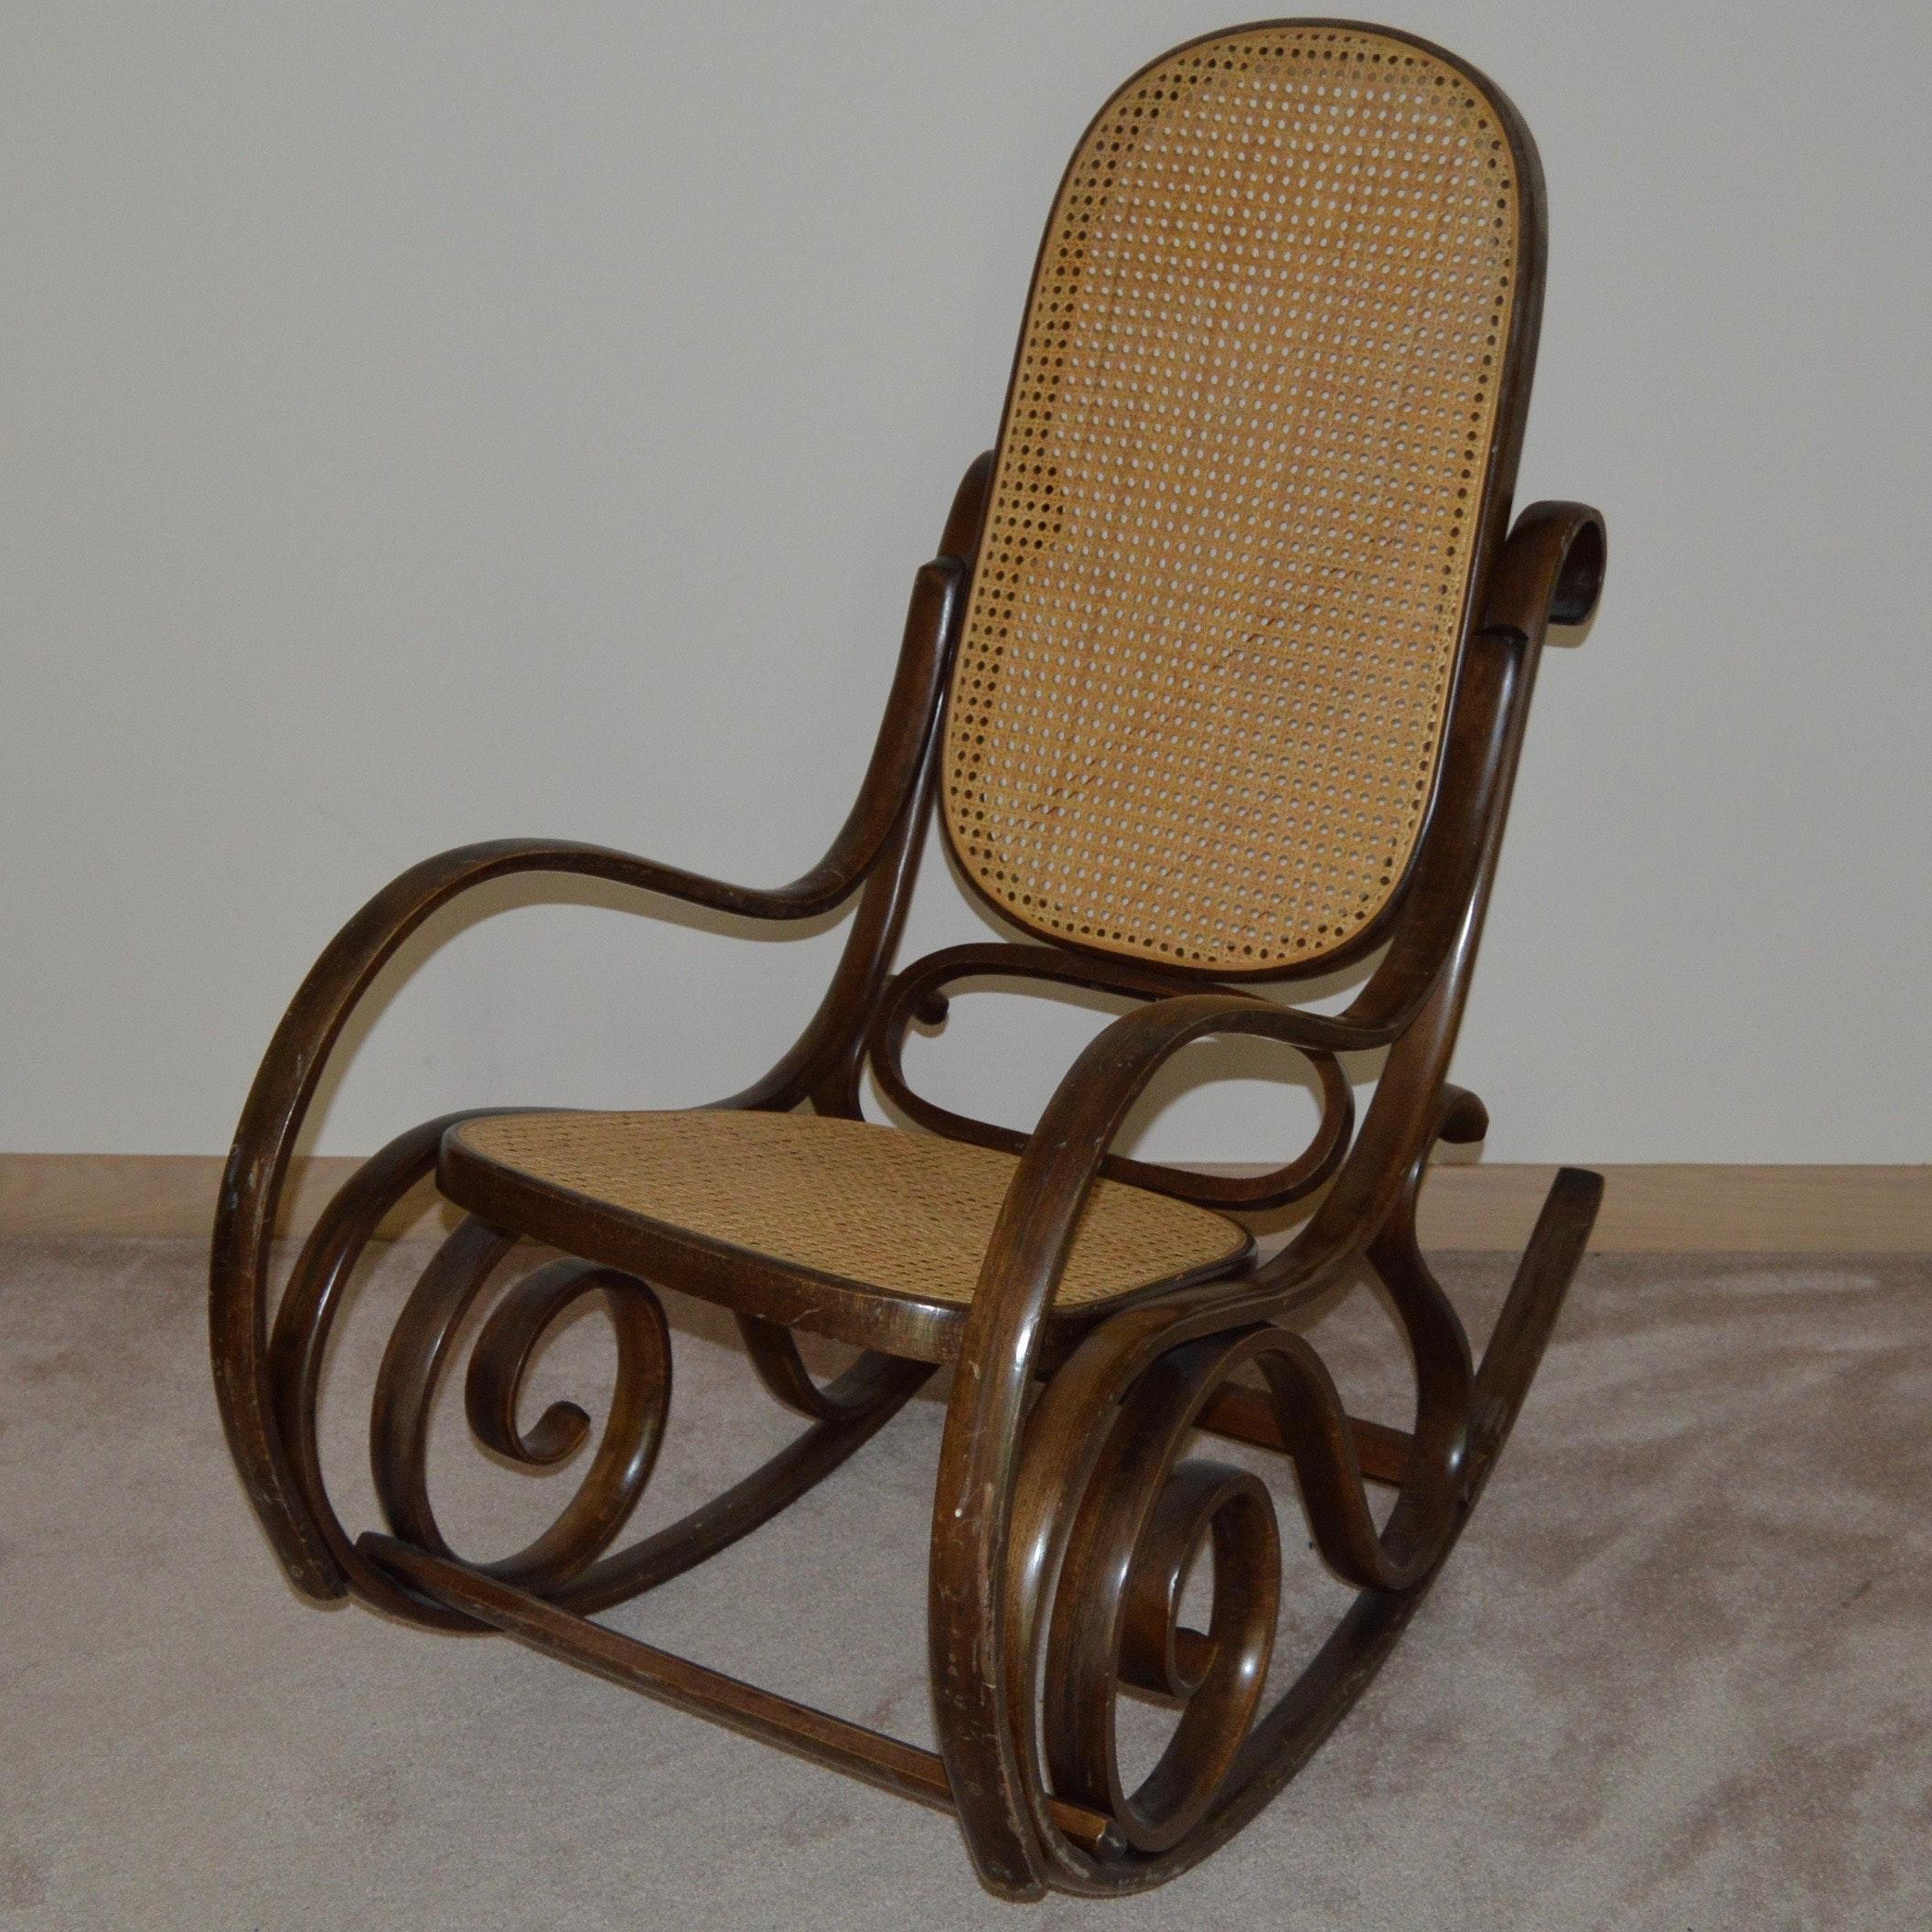 Wonderful Thonet Style Bentwood Cane Rocking Chair ...